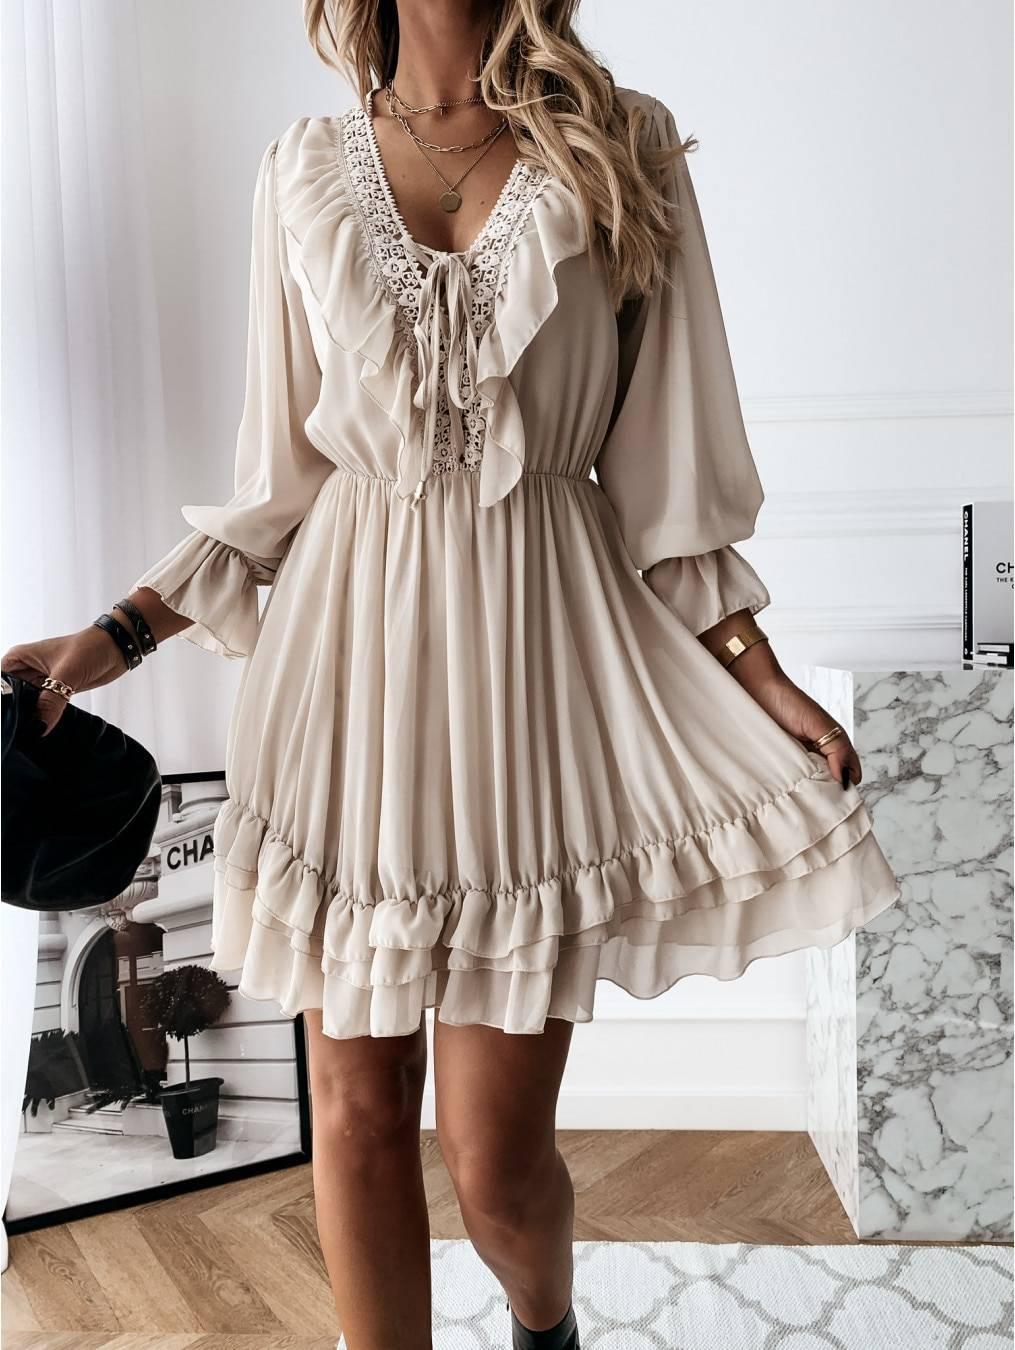 Women Dress 2021 Spring Autumn Sexy Lace Mini Dress Elegant Long Sleeve Ruffle Chiffon Dress Deep V Neck Ladies Clothes Vestidos